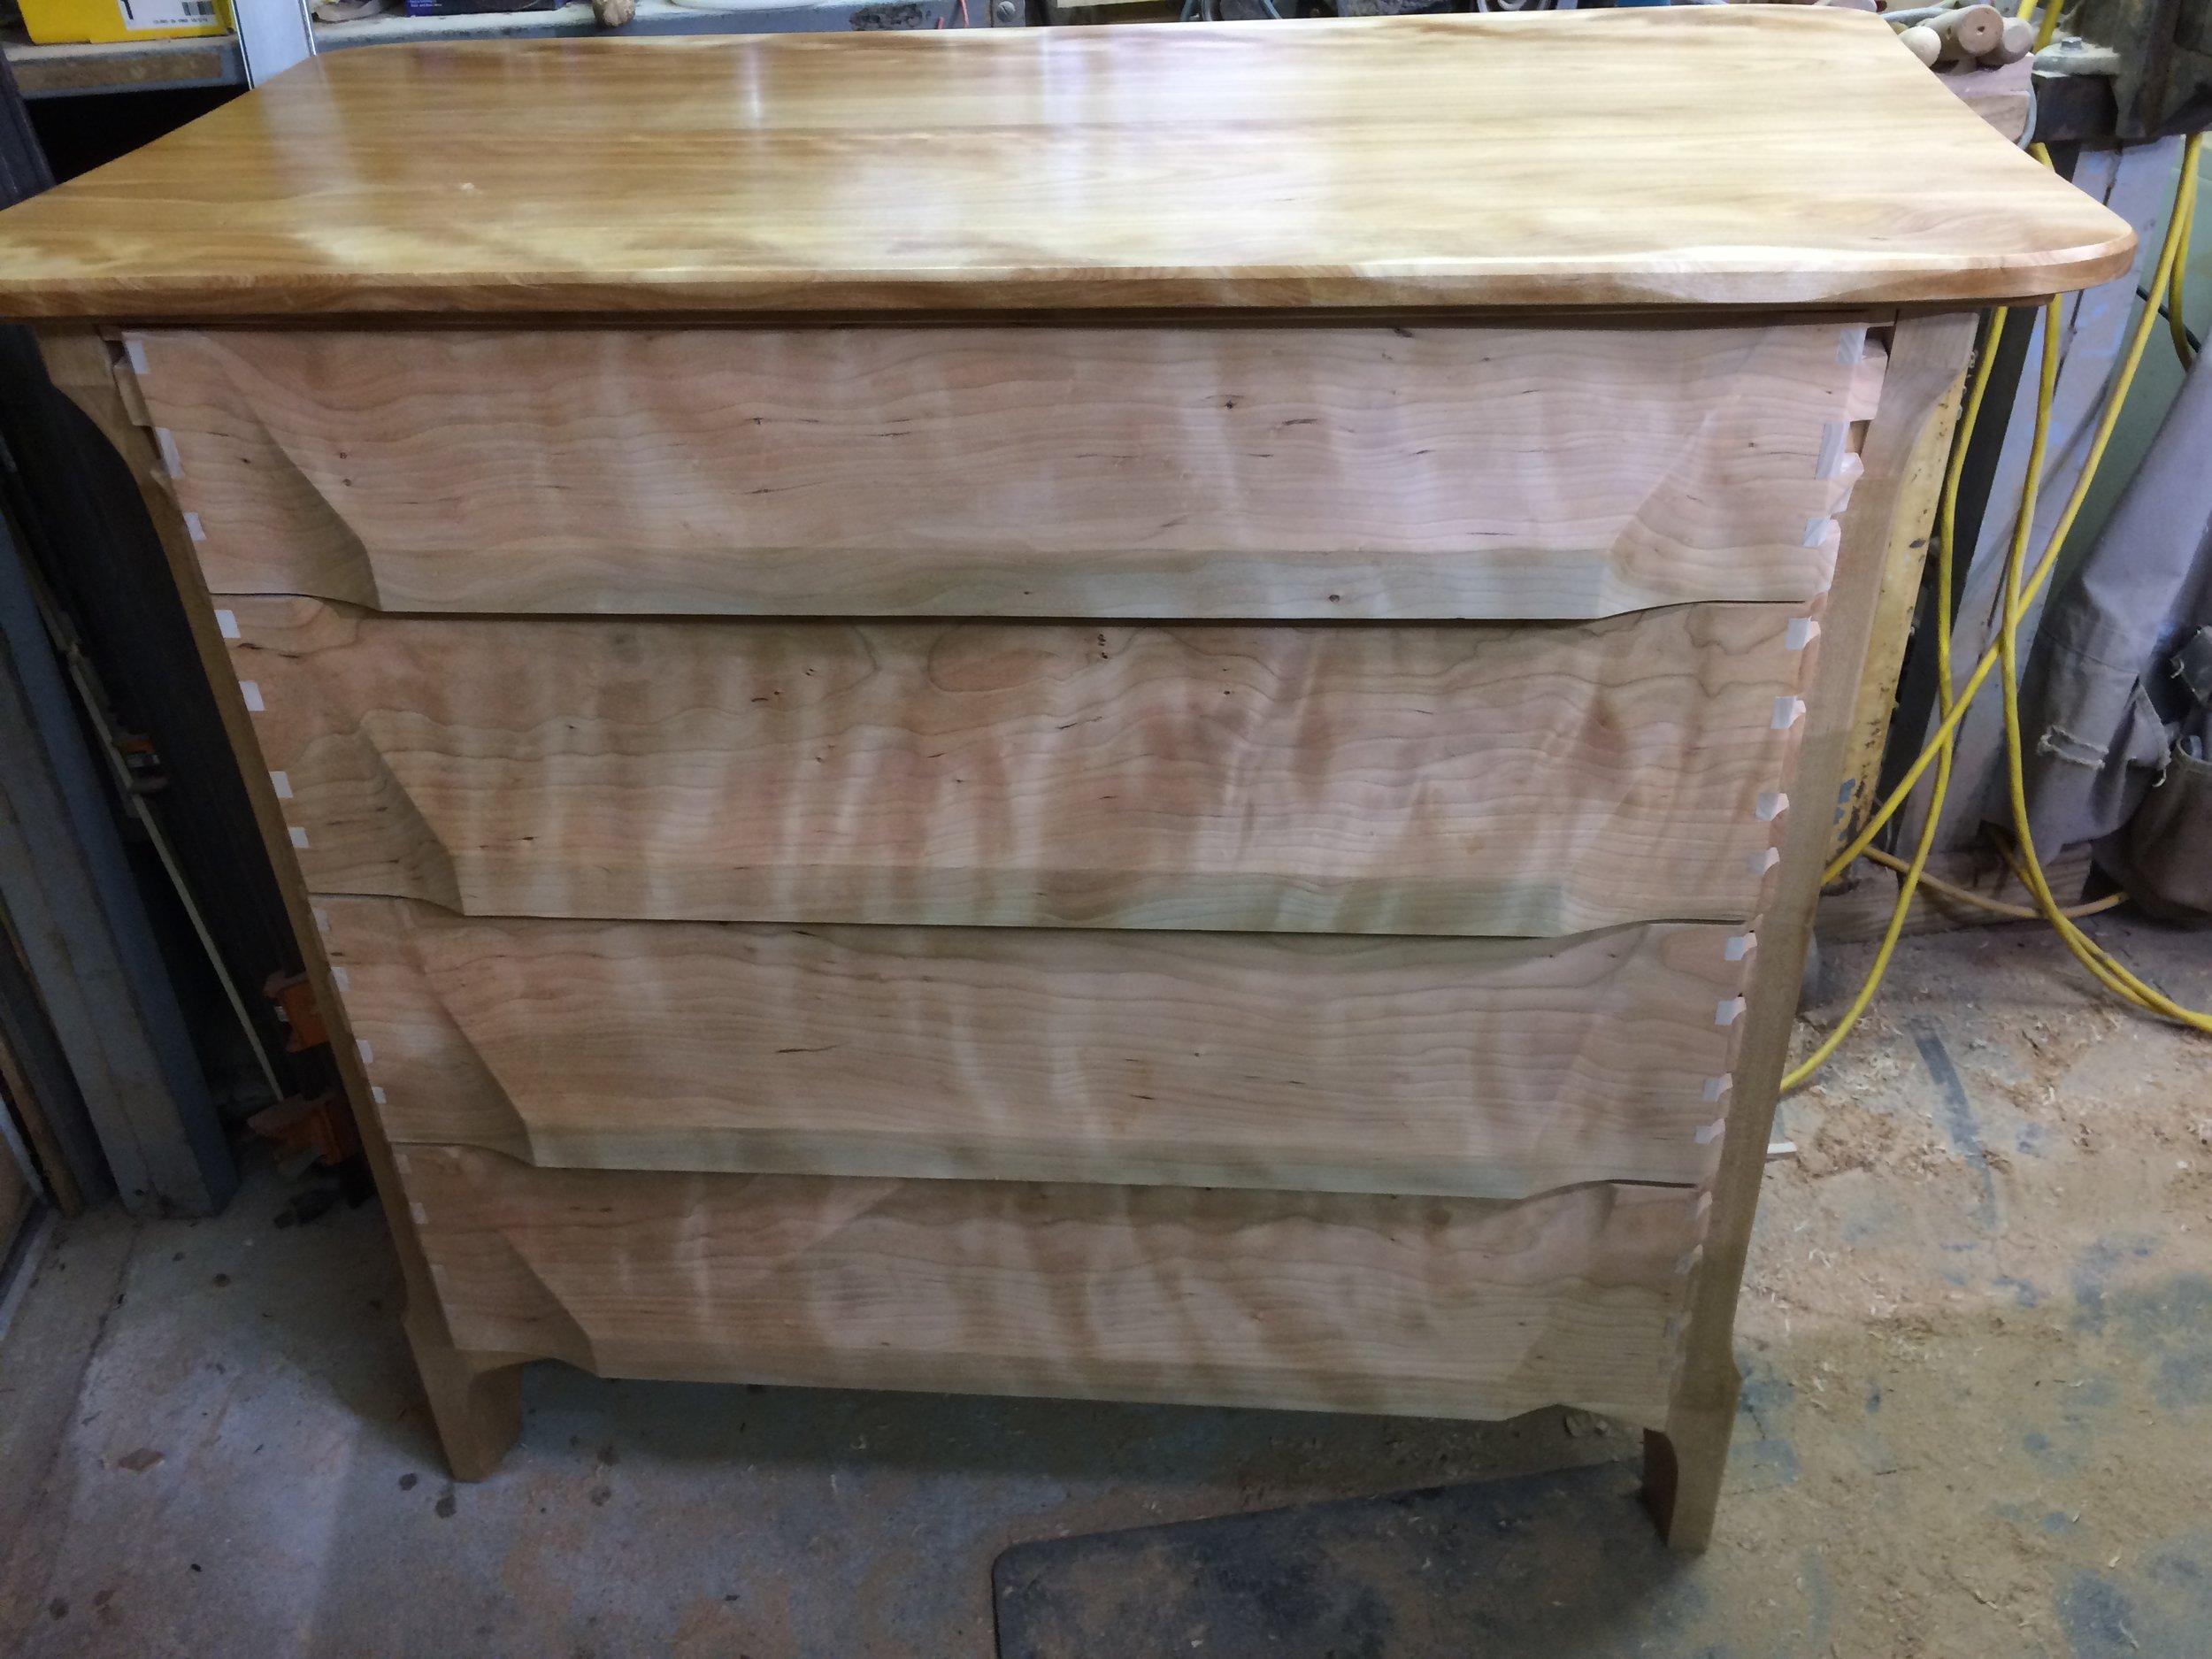 dry fit, drawers installed- undermount Blum soft close sliders